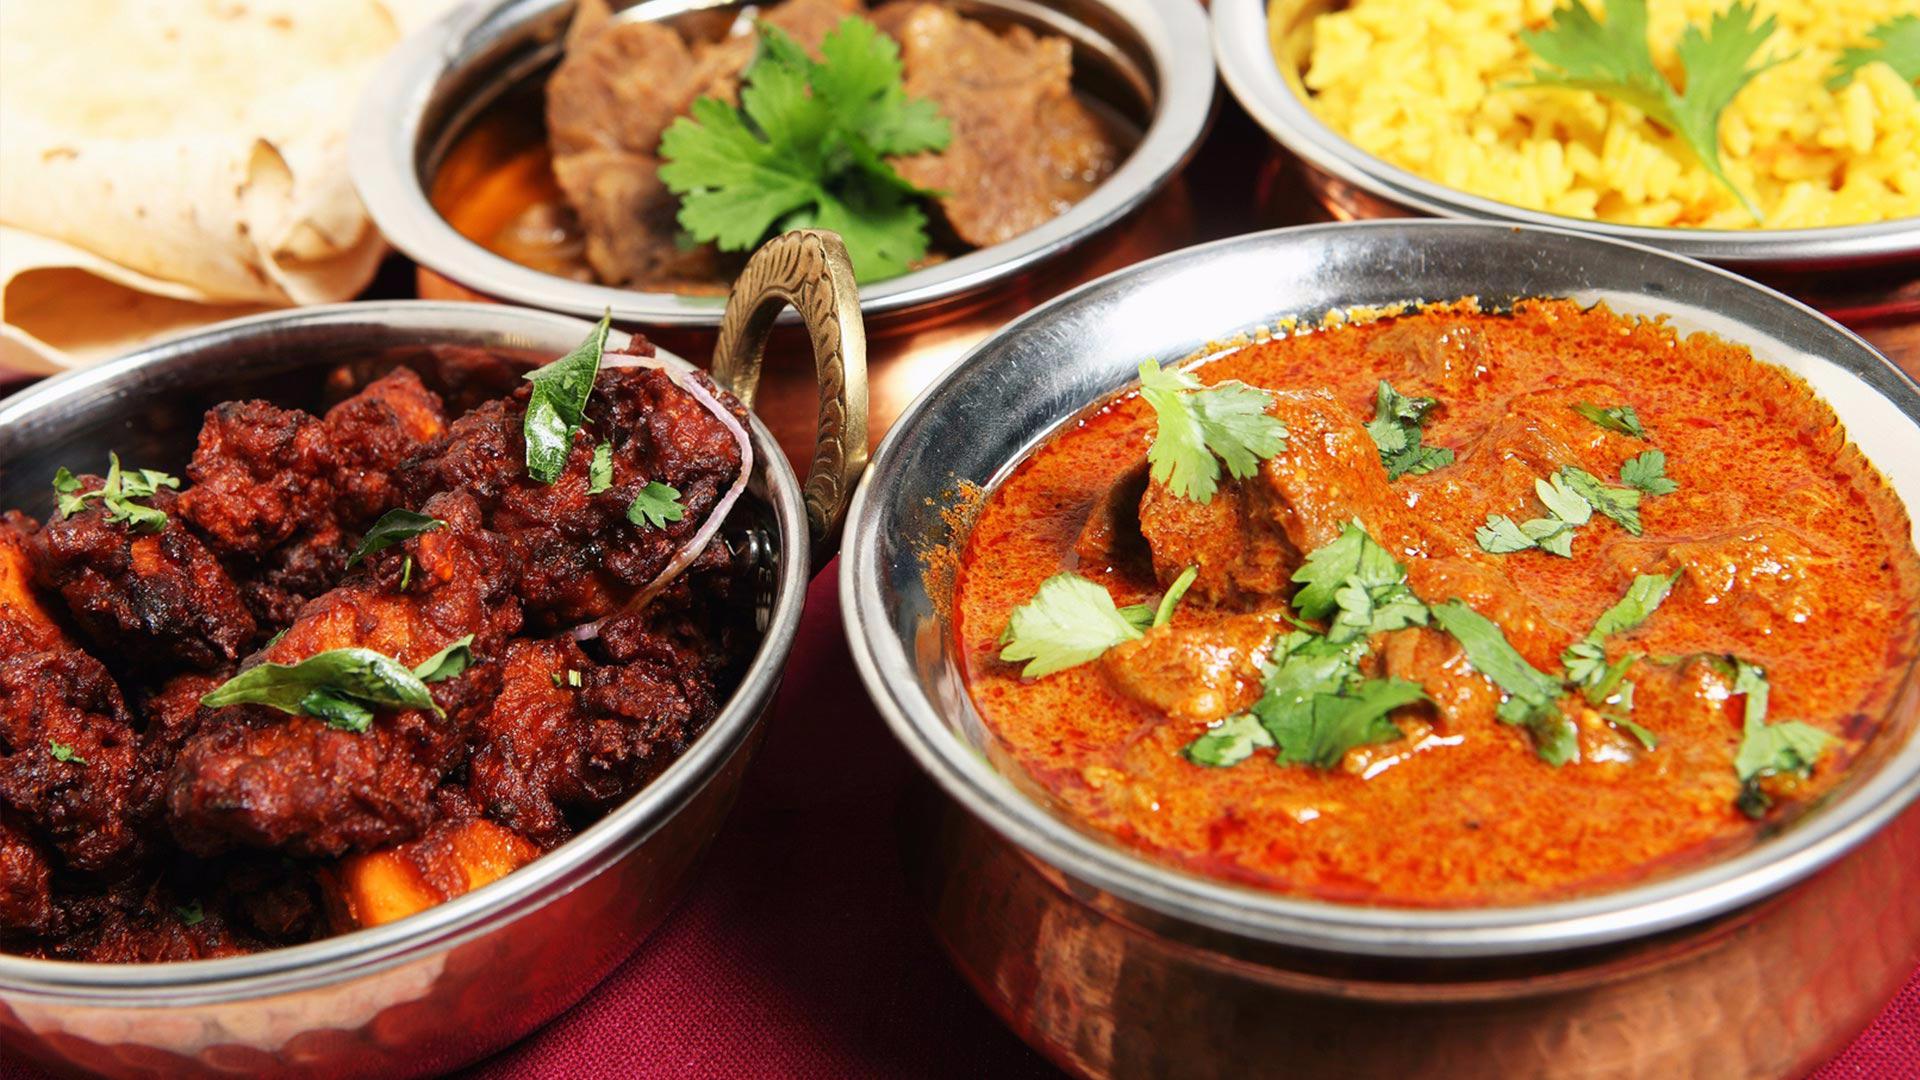 Best Indian Restaurant in Orlando, Spice Indian Grill